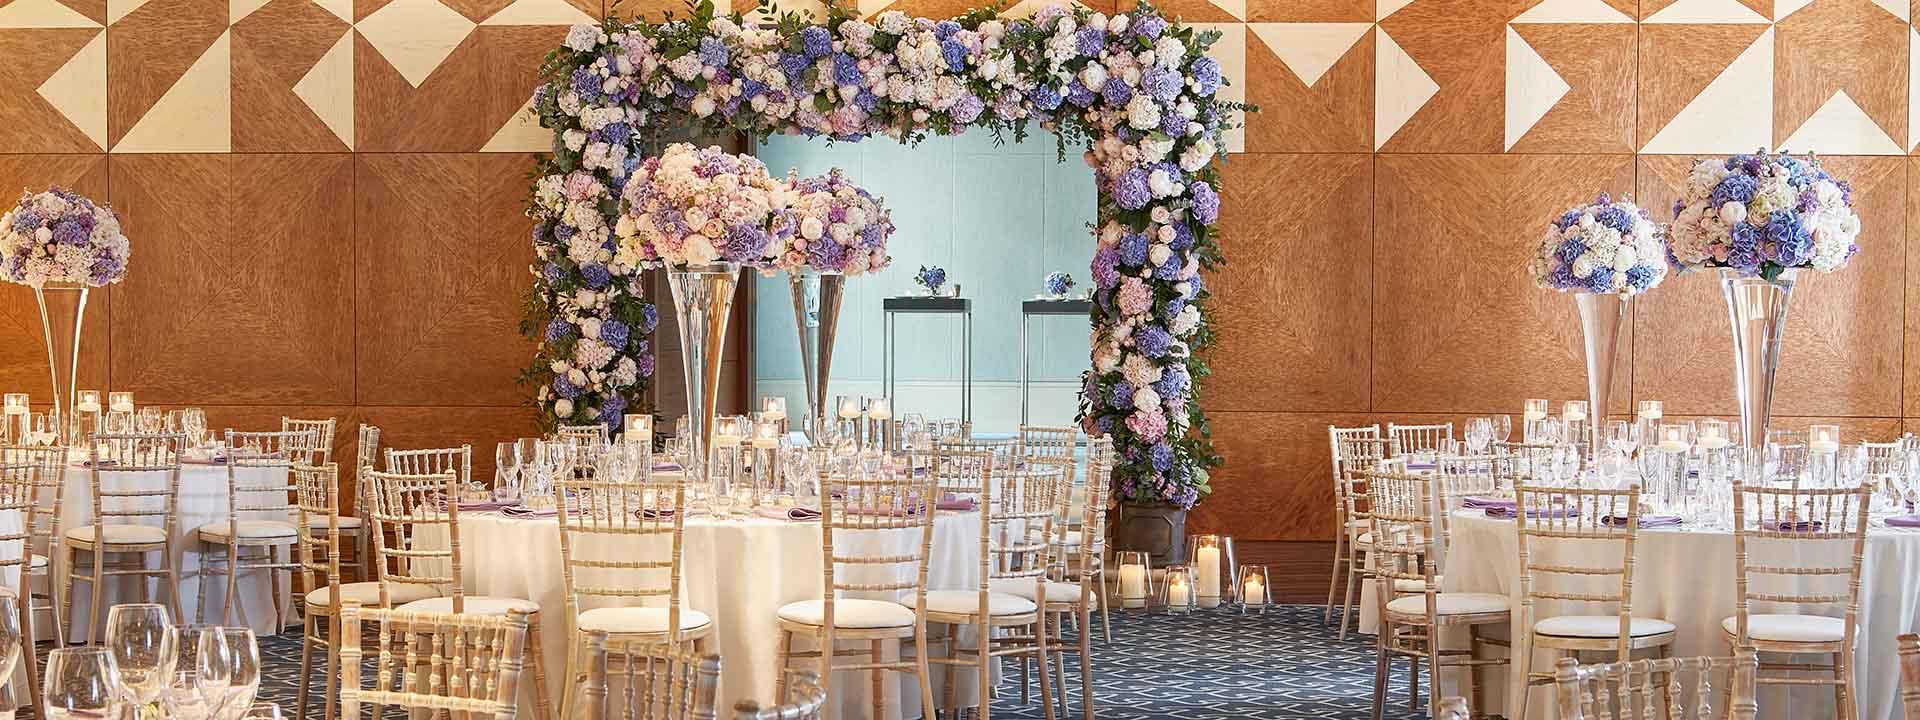 Ballroom wedding at The Berkeley